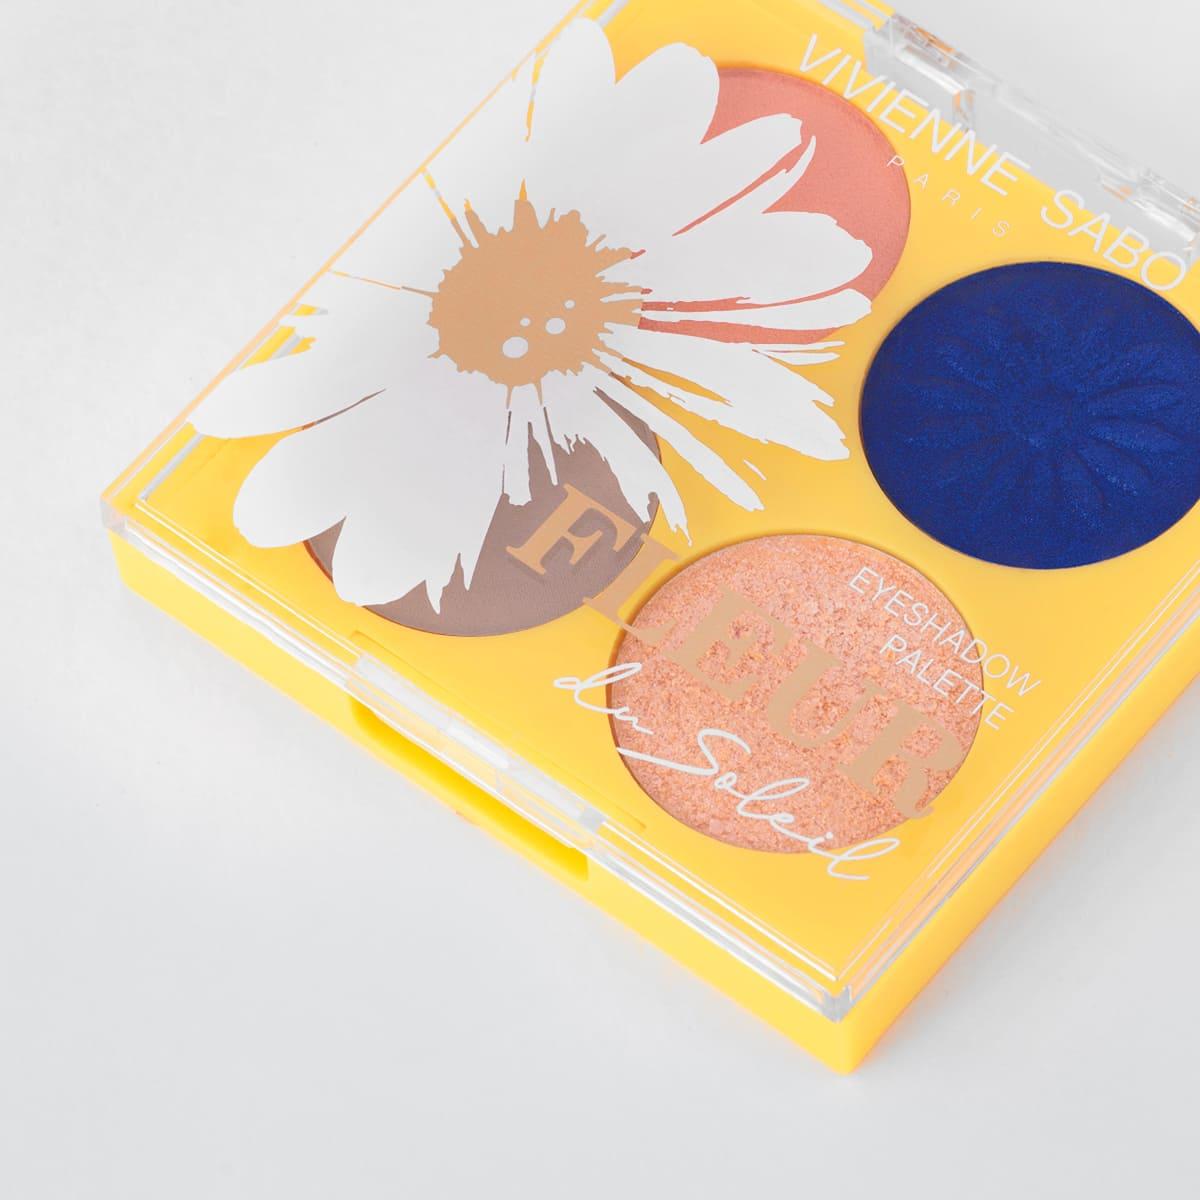 Vivienne Sabo - Eyeshadow Palette - Fleur du Soleil 02